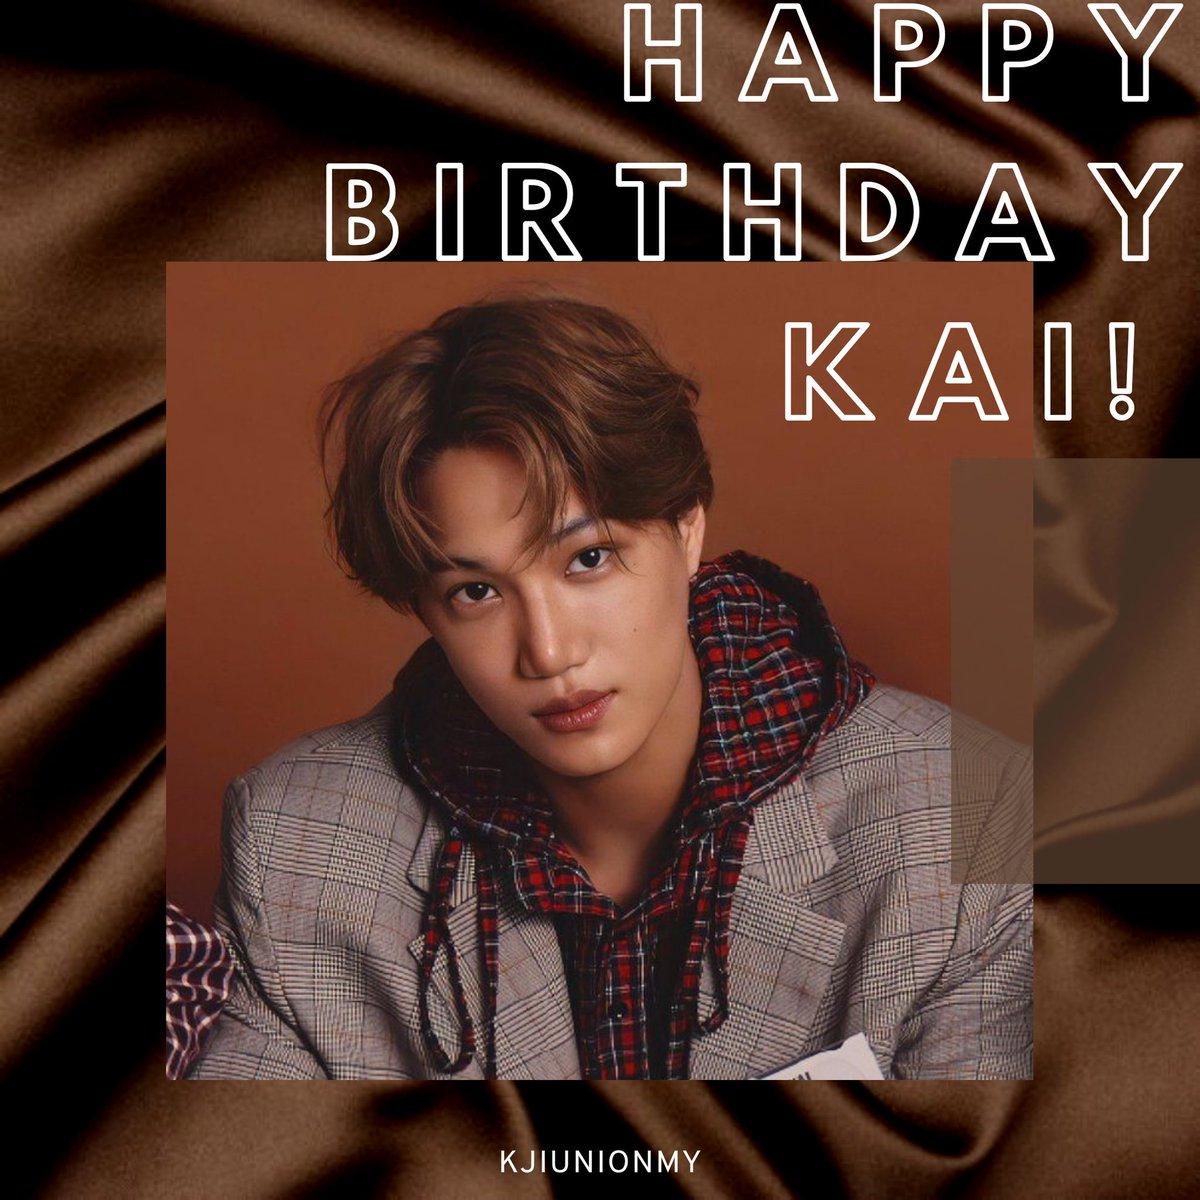 Happy Birthday to our dearest KAI 🥰🥳💛 Lets be happy forever 💛  #ArtistKaiDay #HappyKaiDay #종인아생일축하해 #가장_따뜻한_겨울_카이데이